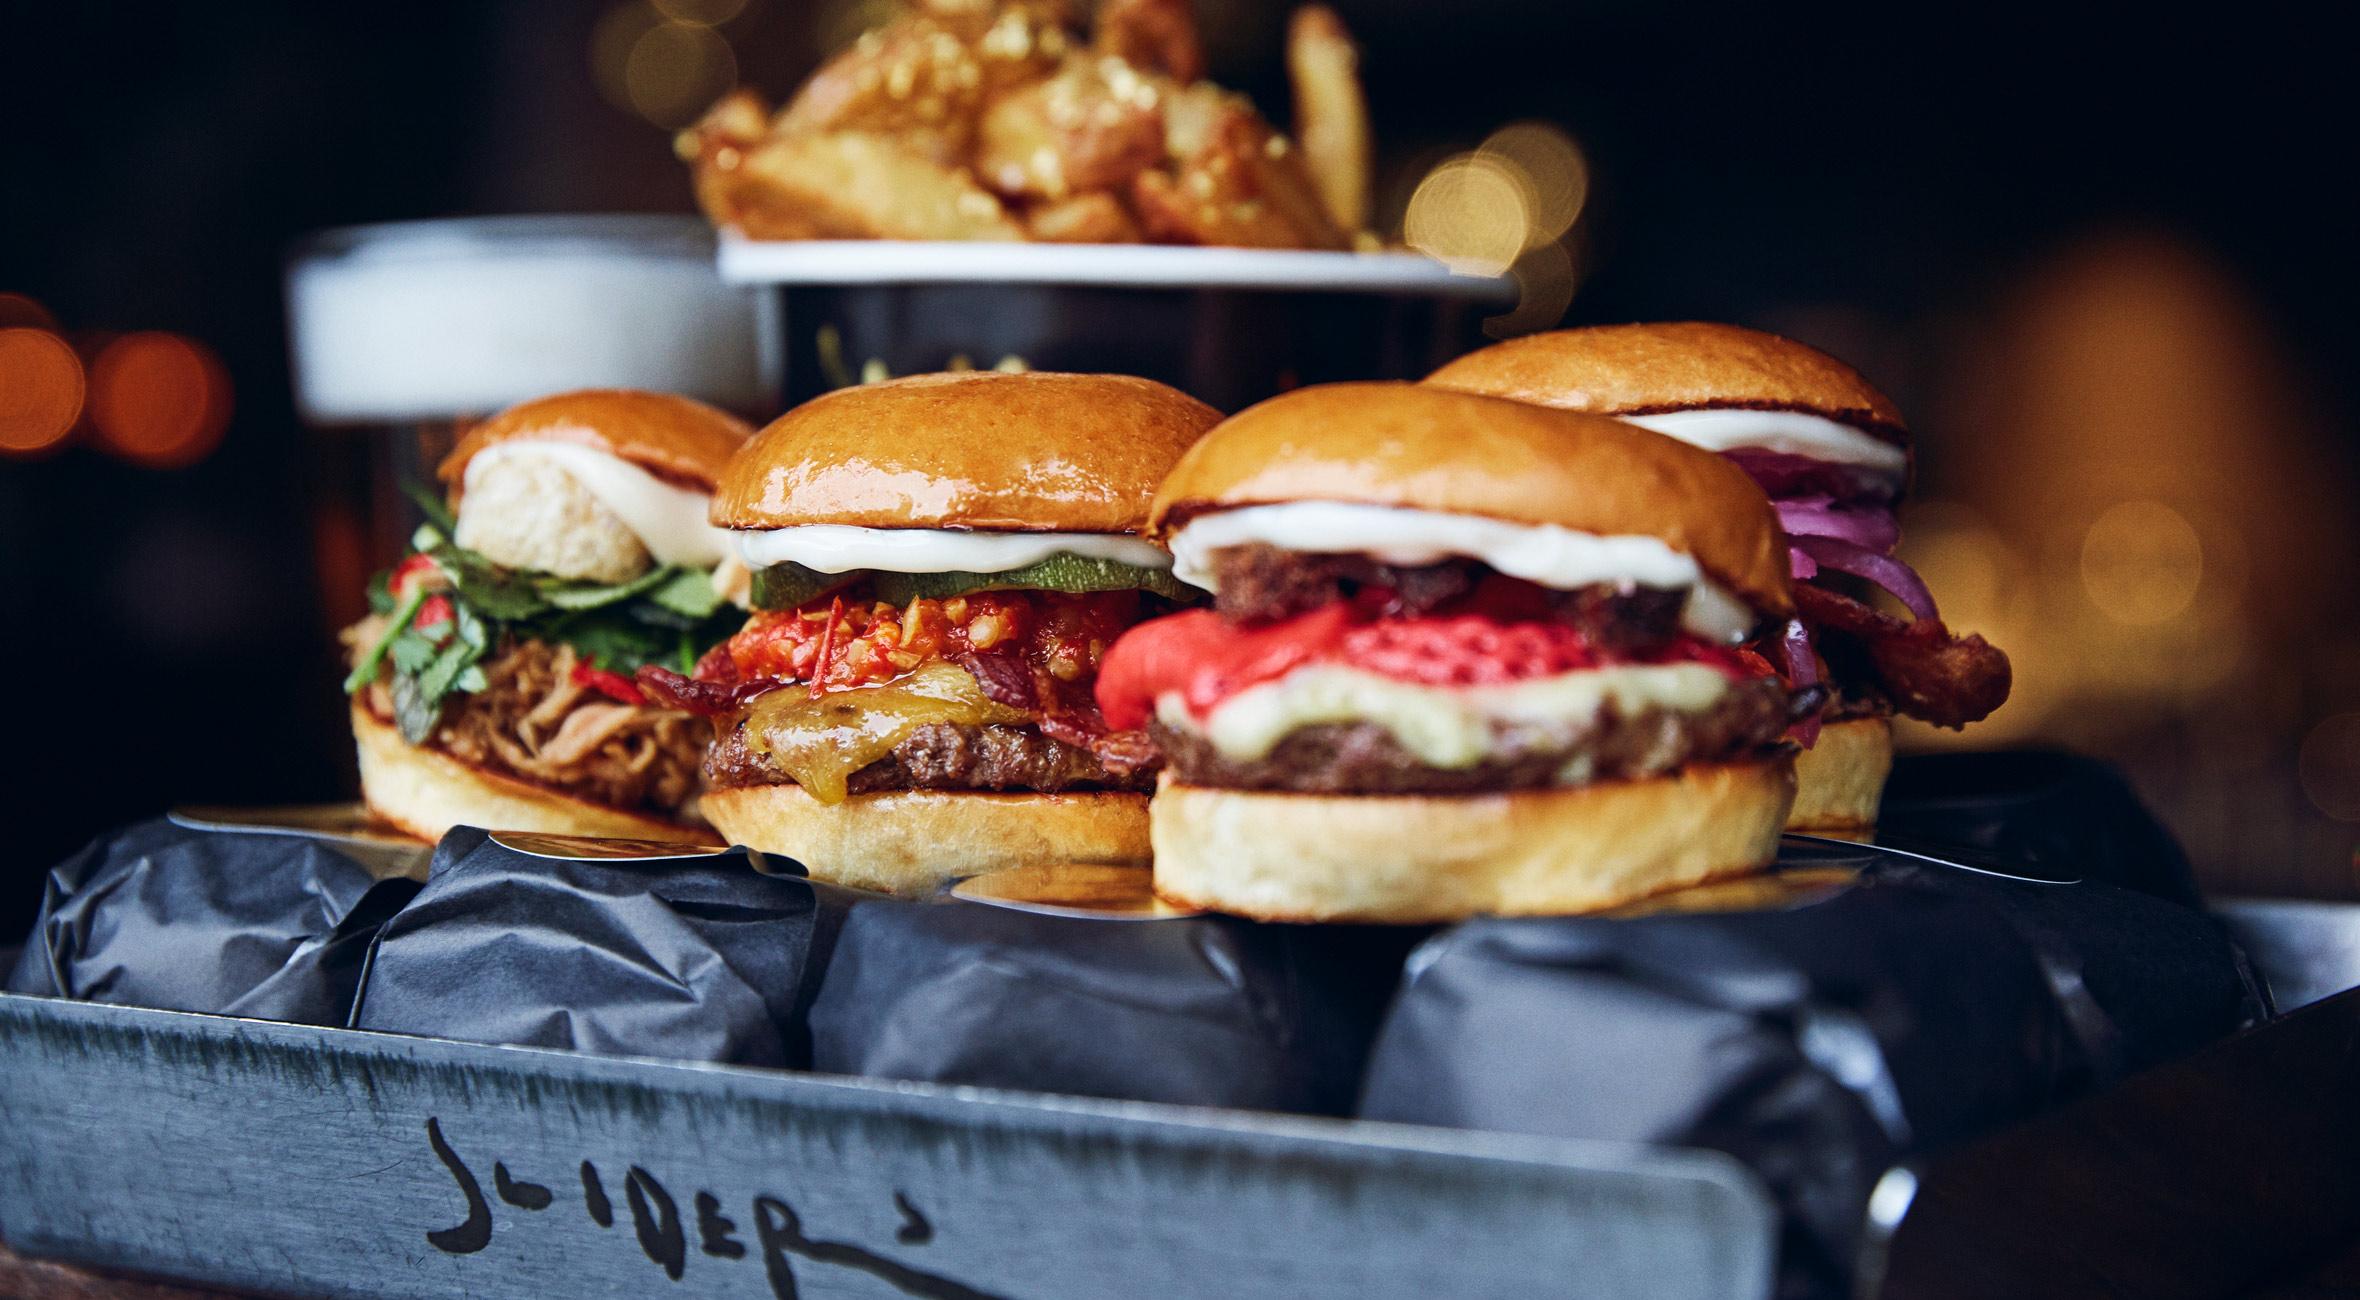 2 frokostmenuer hos Sliders på Nørrebro & Vesterbro – Hip fast food restaurant serverer gourmetburgere i miniformat